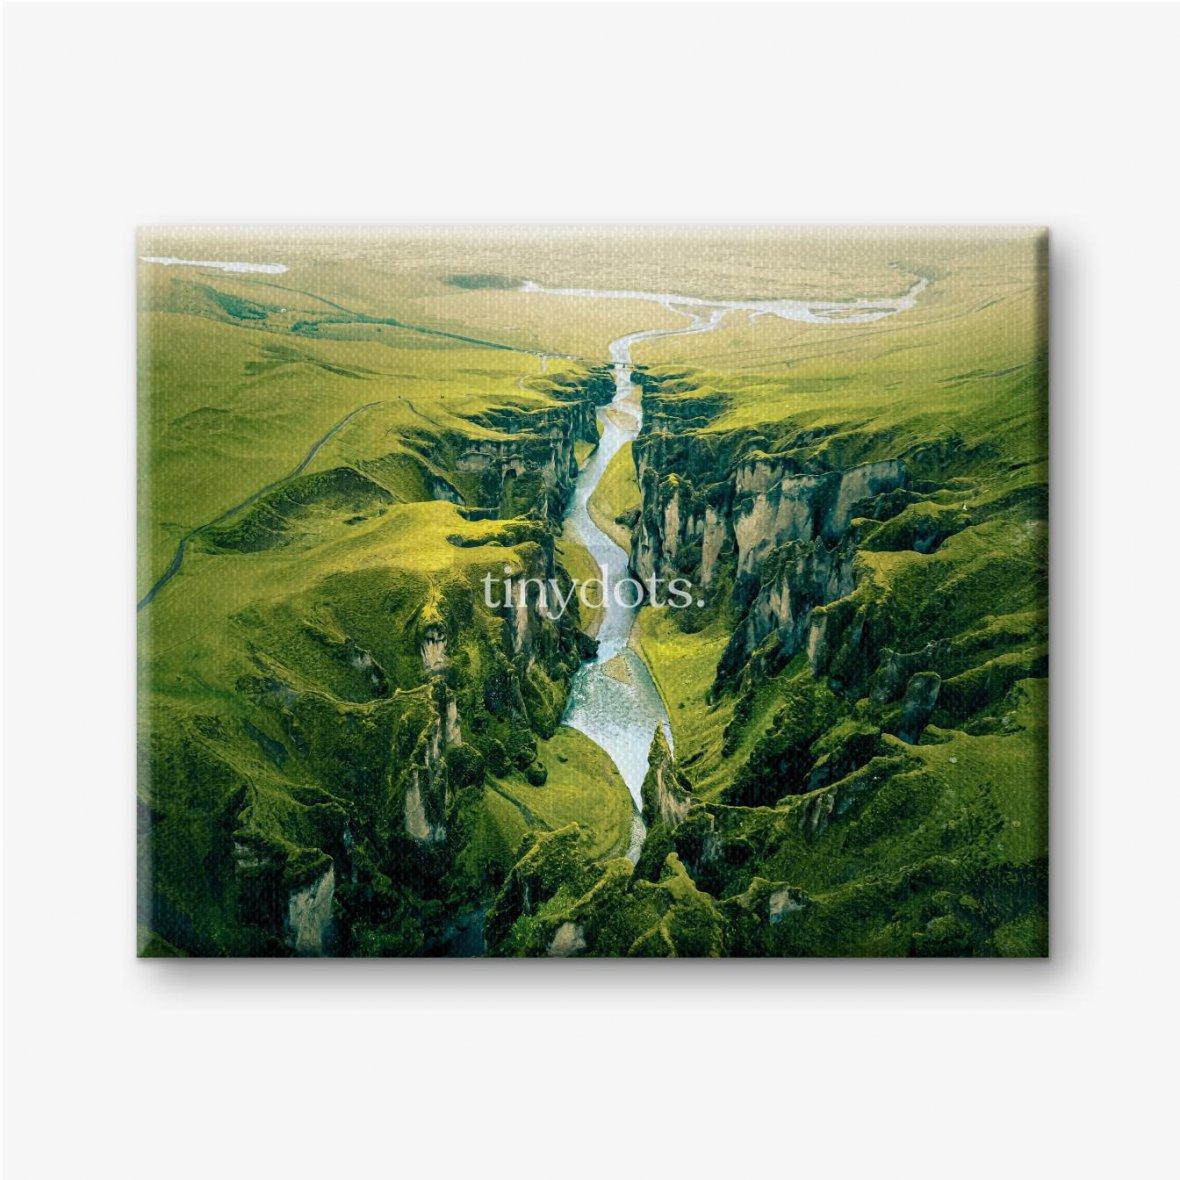 Leinwandbilder Schroffe Landschaft des Fjadrargljufur Canyon in Island. Luftaufnahme.